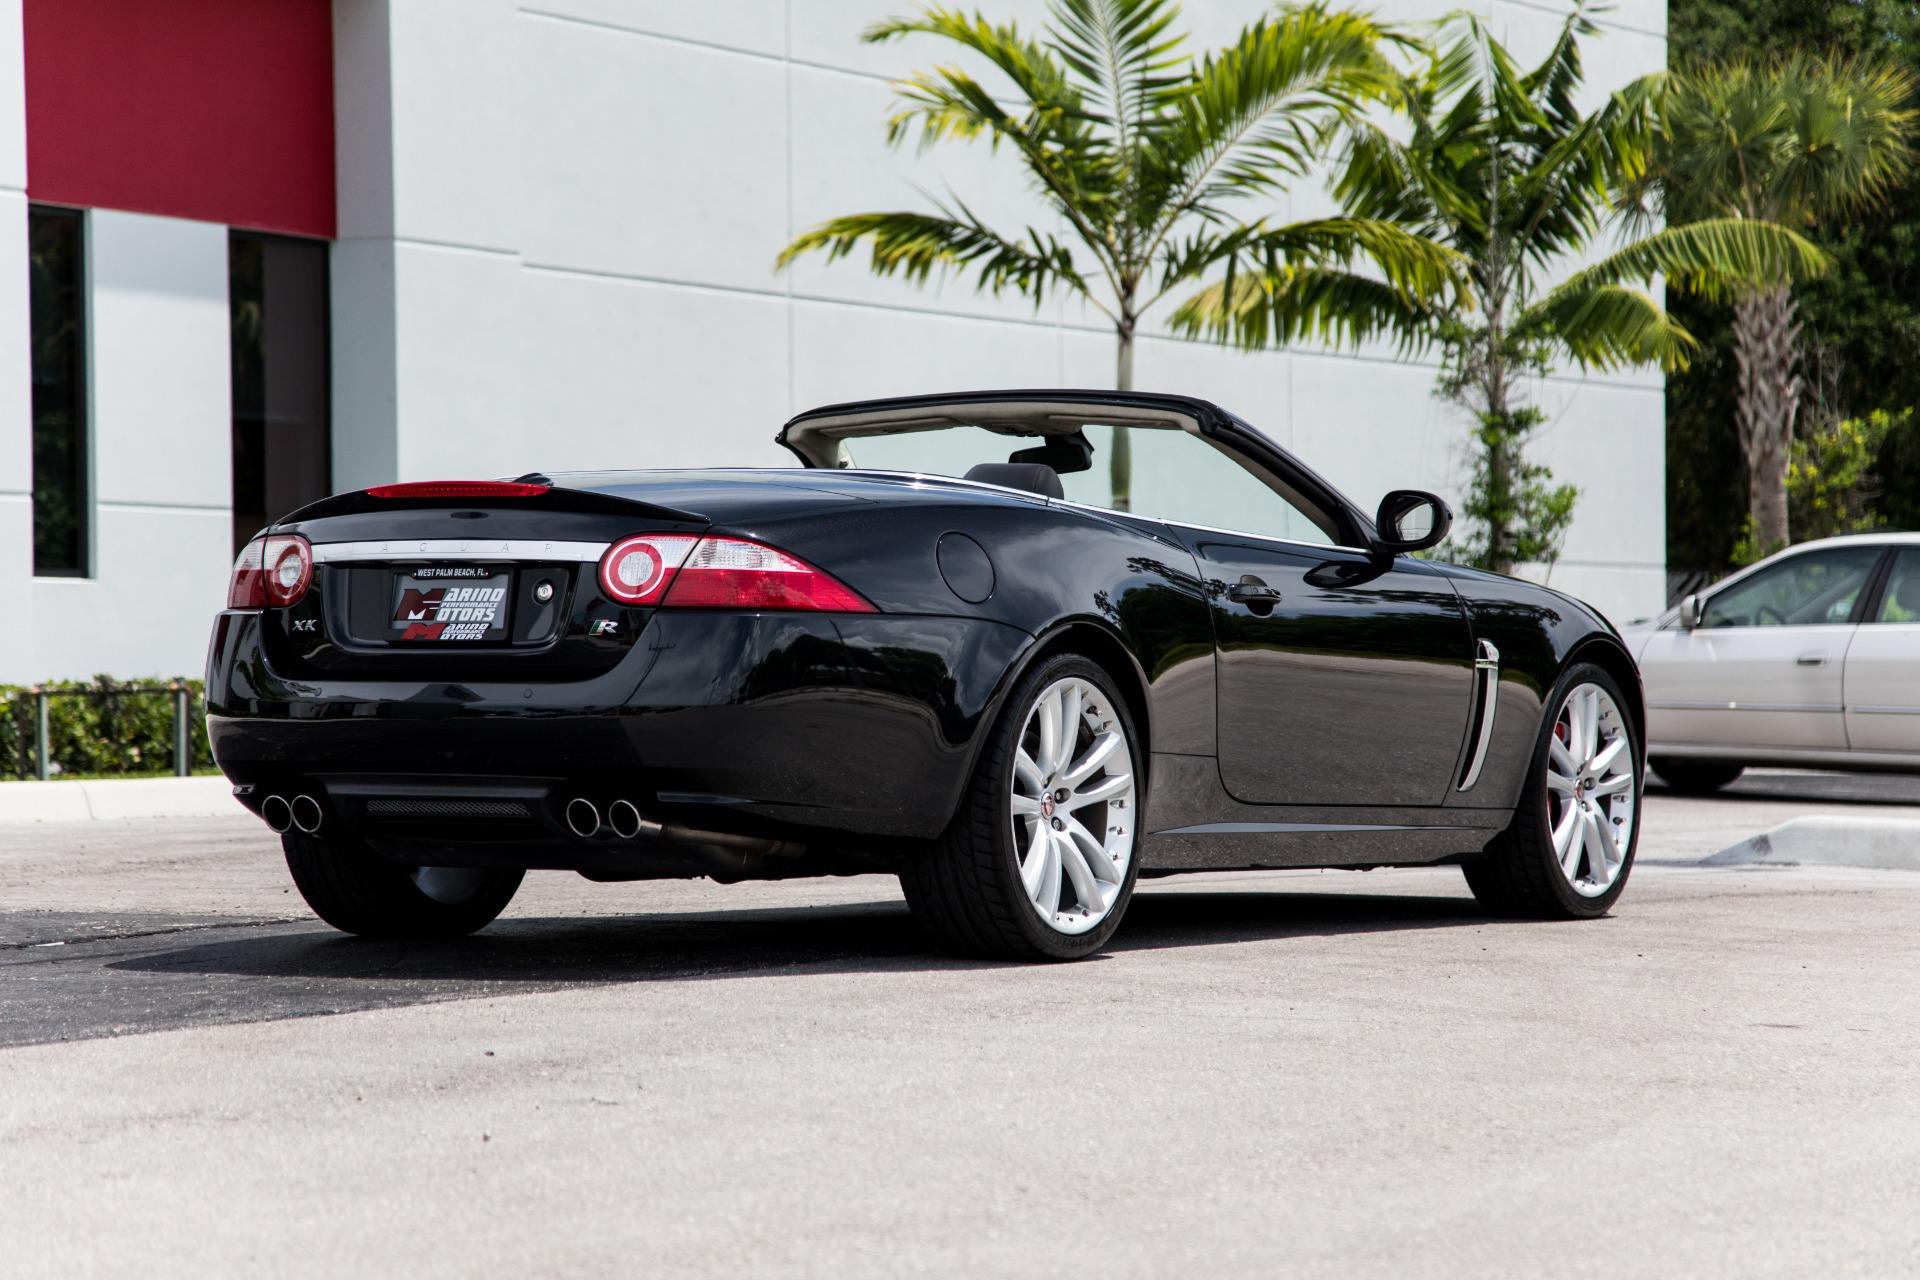 Used 2008 Jaguar XK-Series XKR For Sale ($32,900) | Marino ...